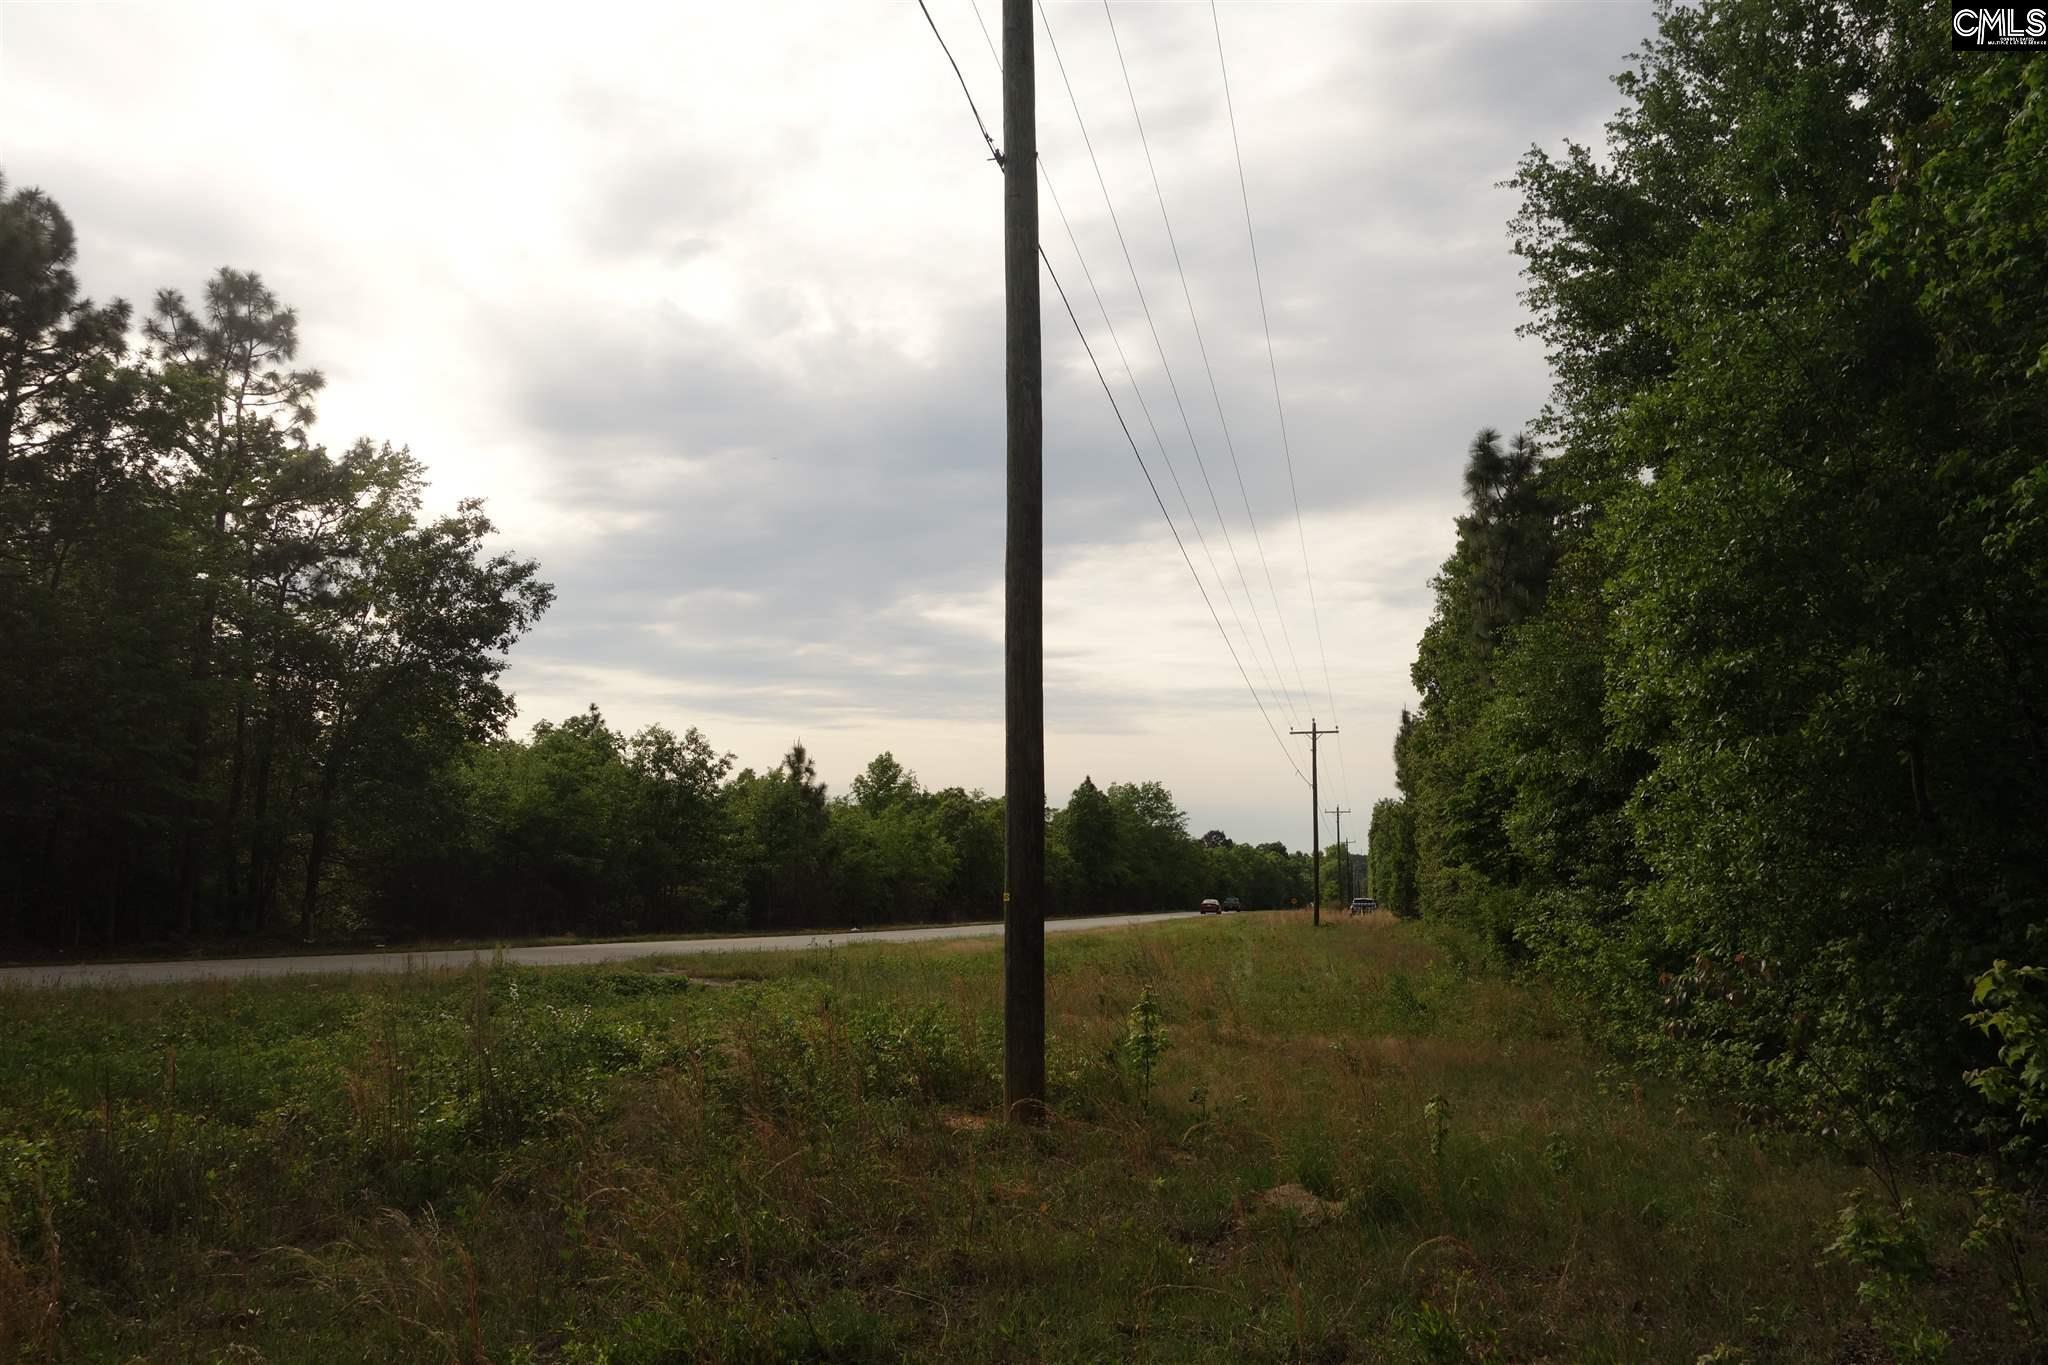 178 Highway Pelion, SC 29123